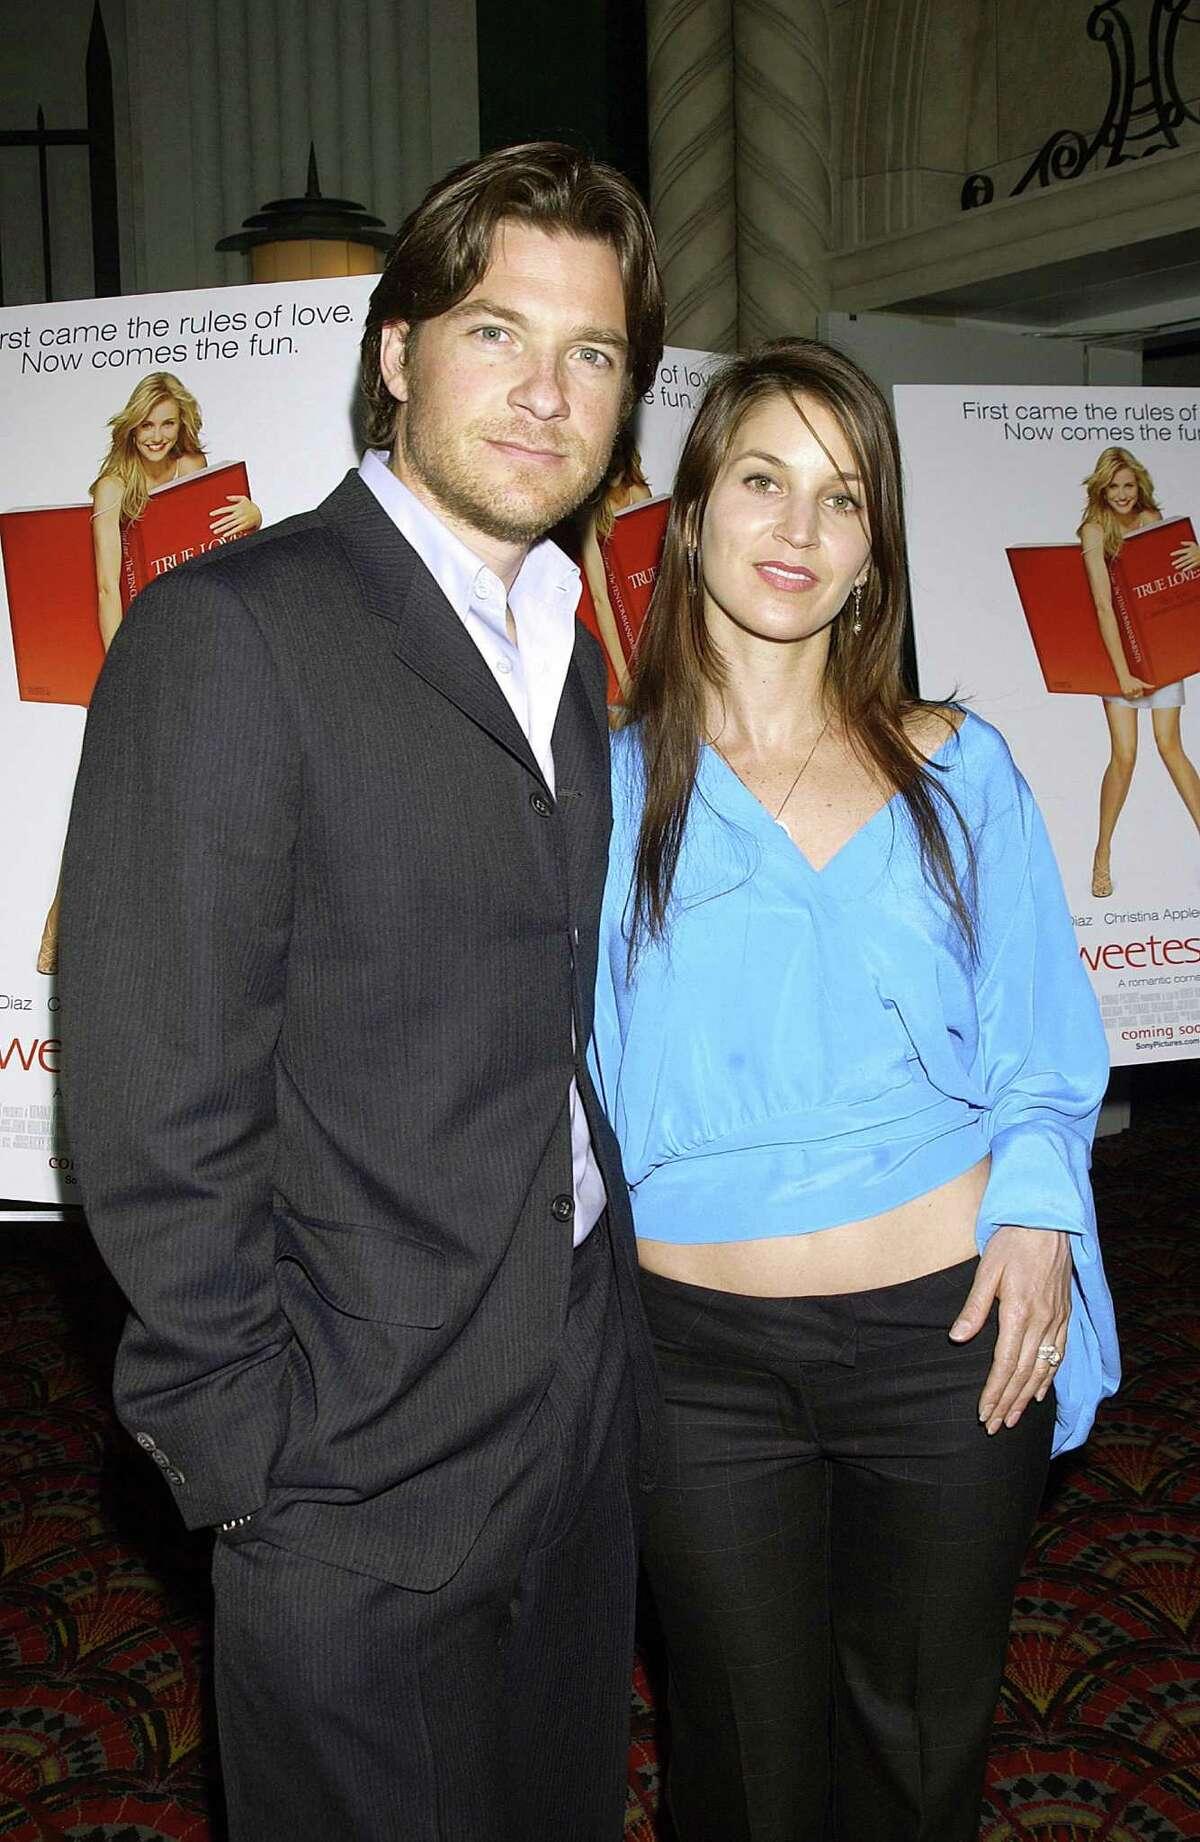 Jason Bateman, aka Michael Bluth, pictured in 2002 with wife Amanda Anka.